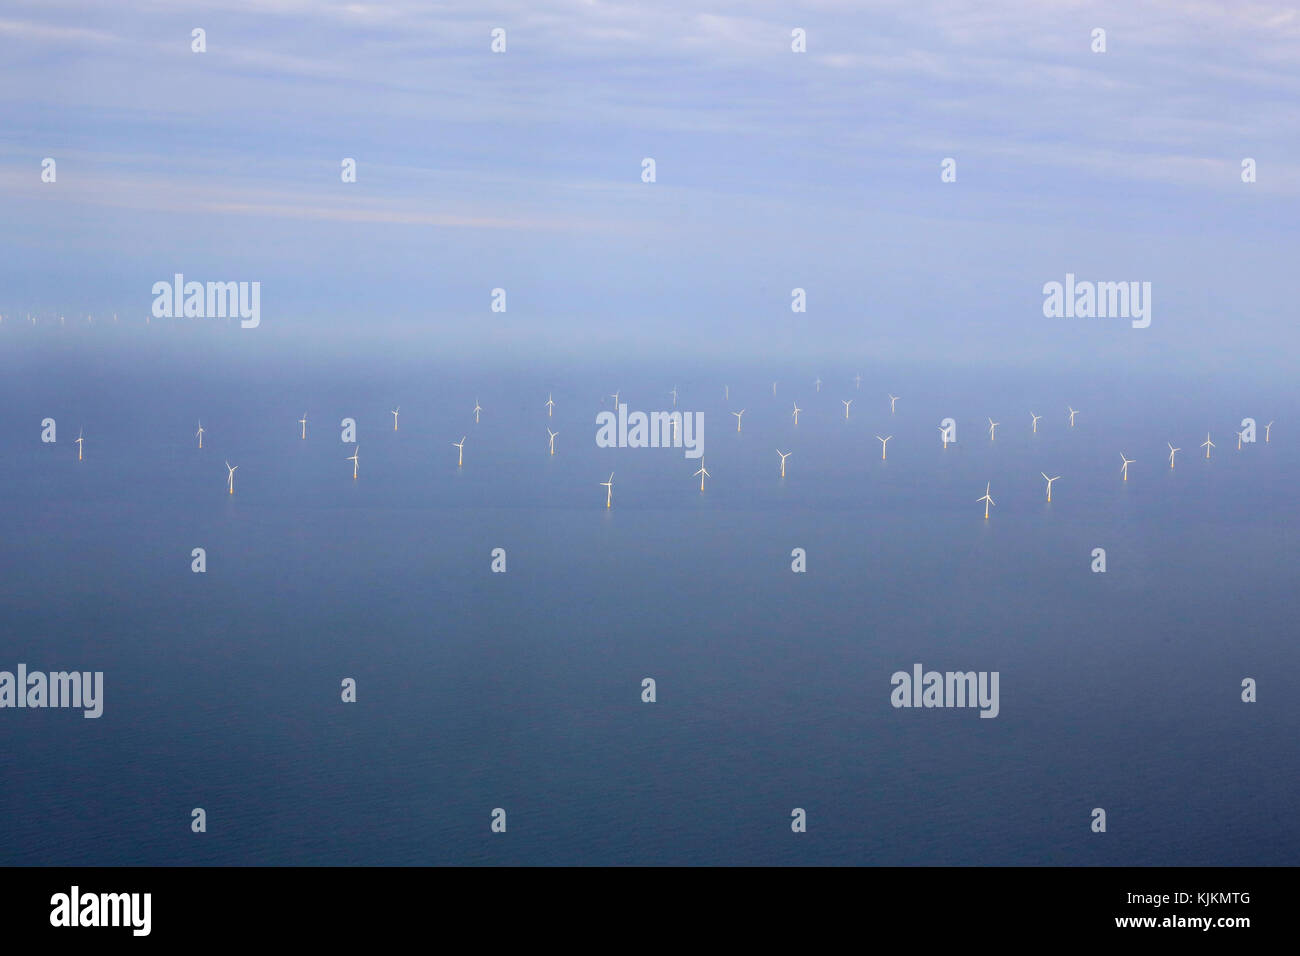 Off shore wind turbines. - Stock Image